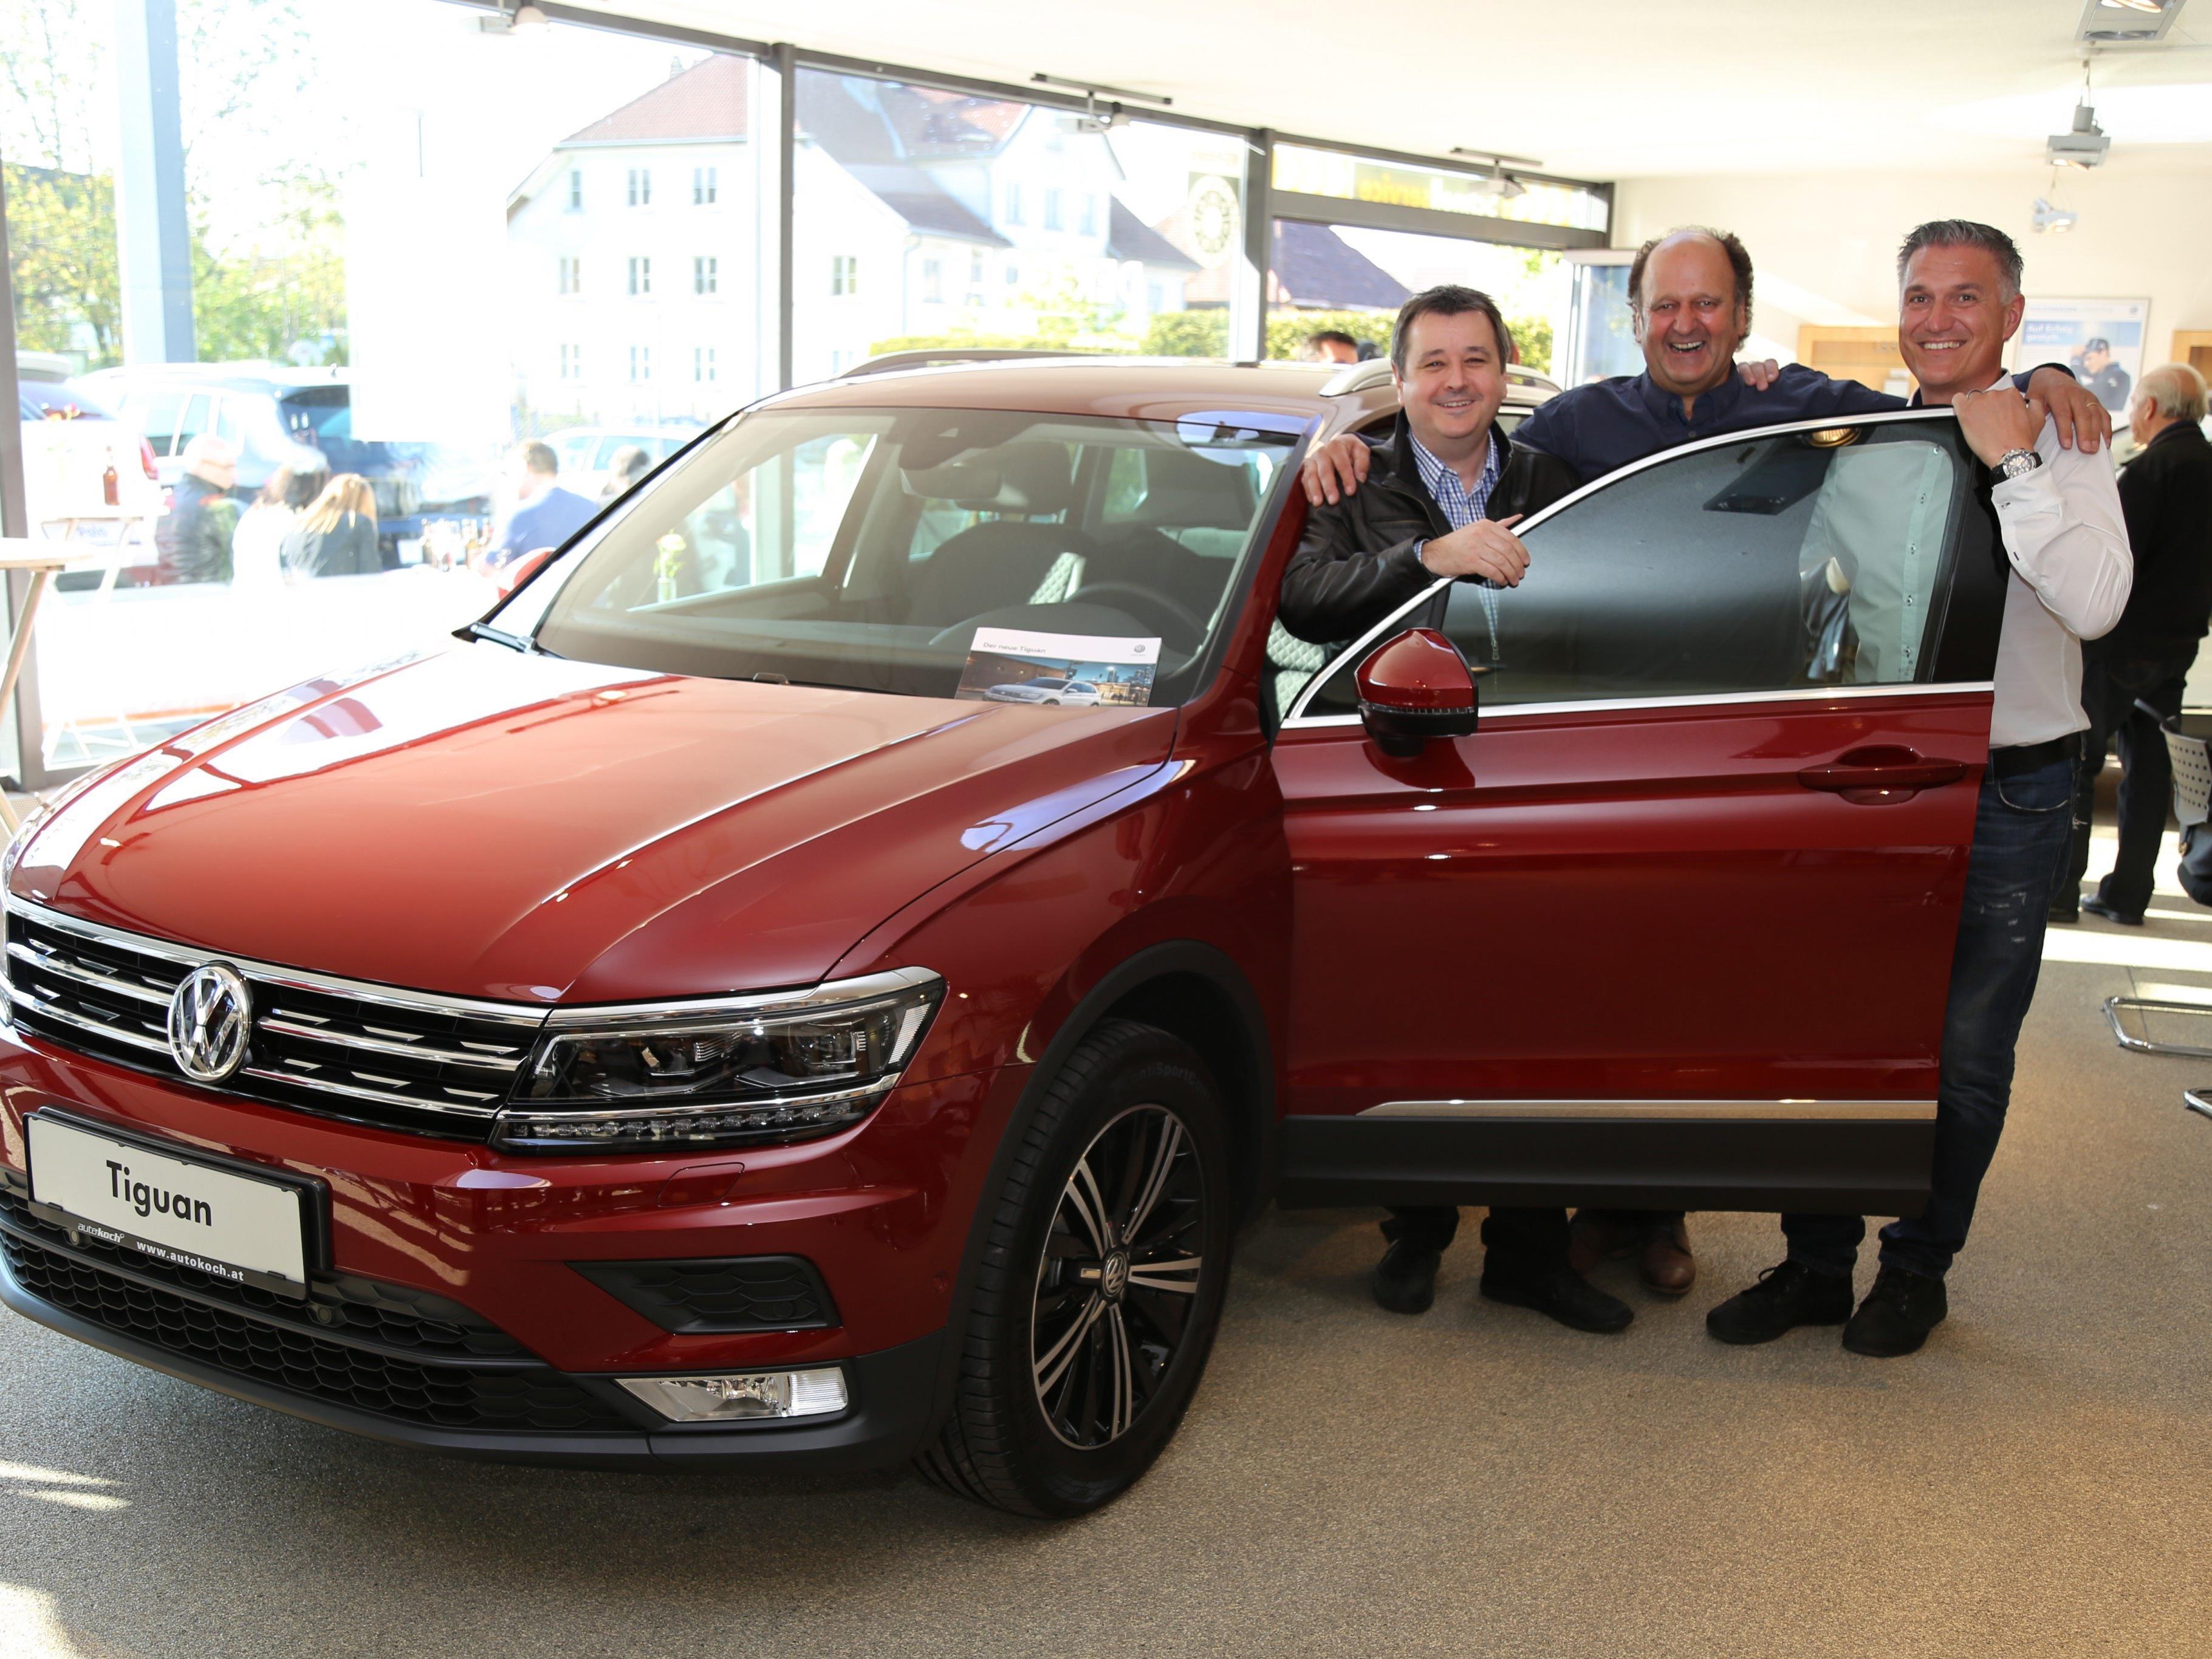 Das Autohaus-Koch-Team freut sich den neuen VW Tiguan zu präsentieren.